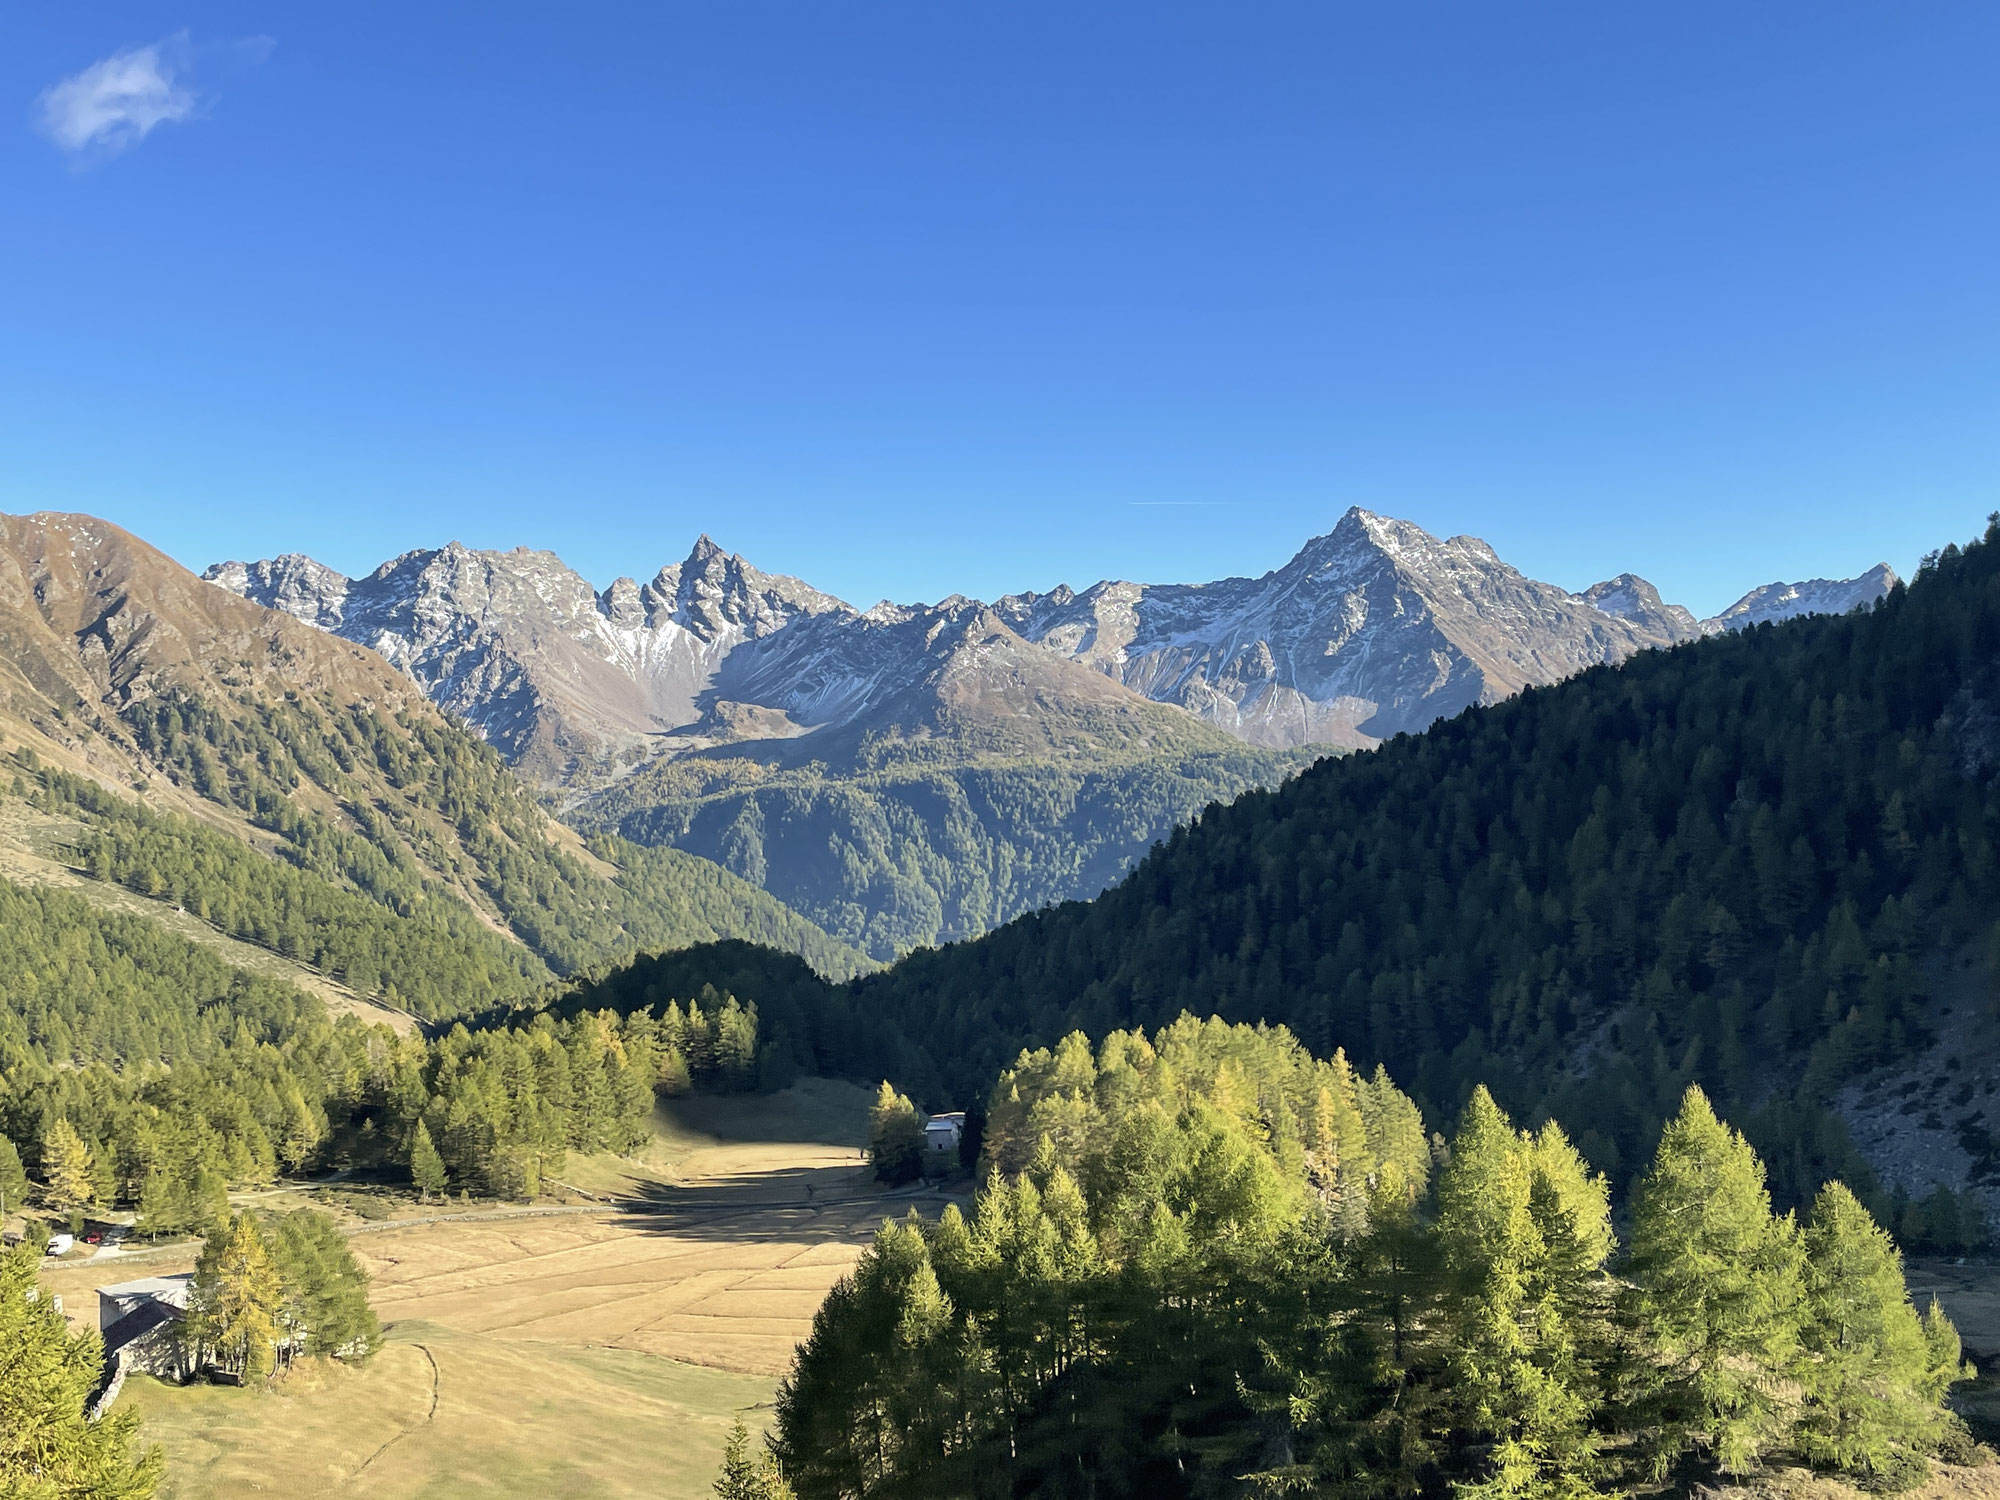 Tag 6 Rückreise über Berge, Täler und Pässe